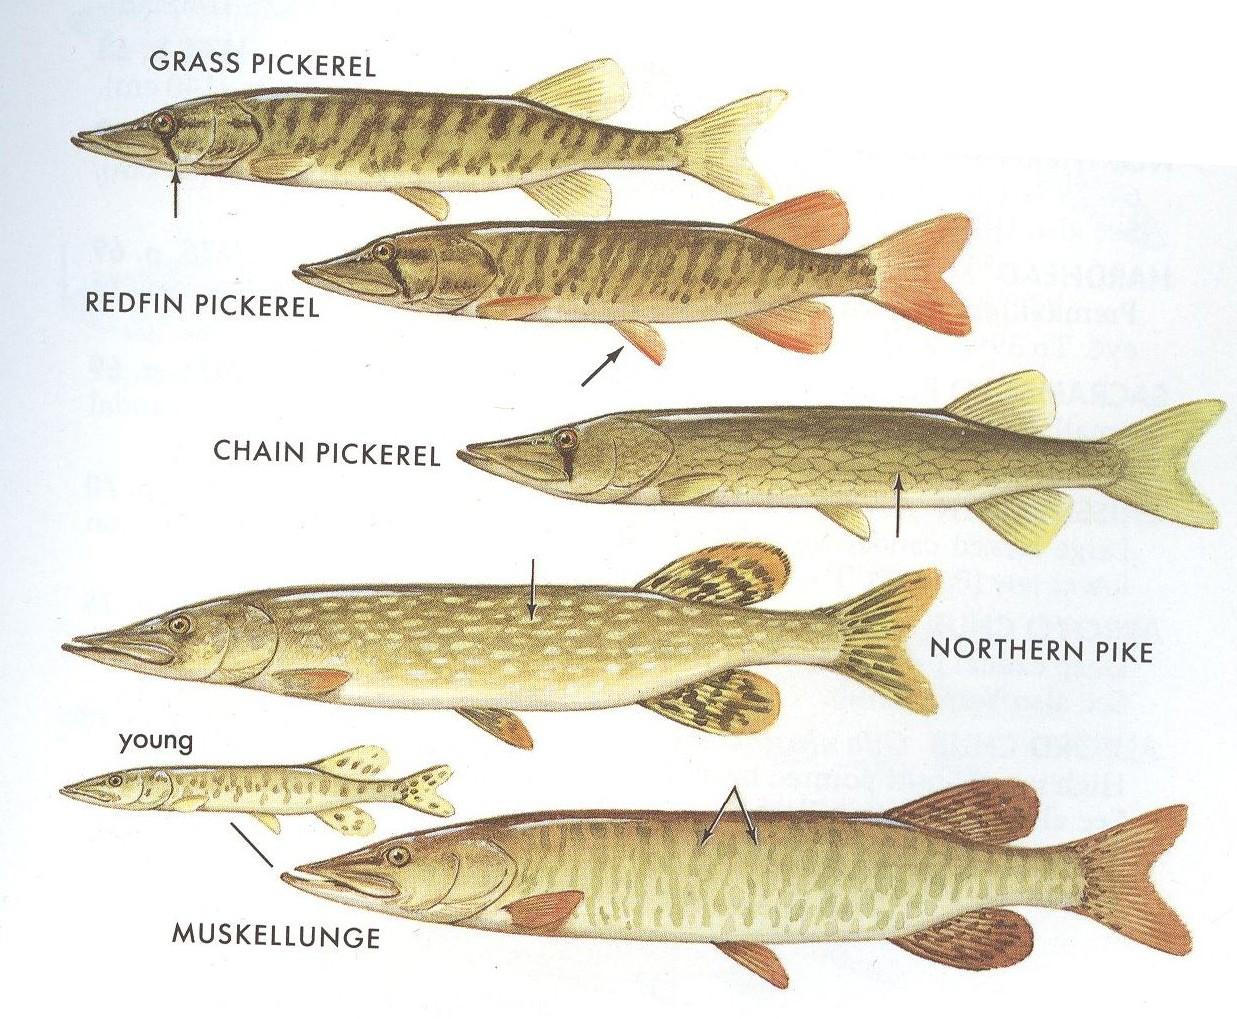 Freshwater fish nc - North Carolina Freshwater Fish Books Gamefish Of 200x300 North